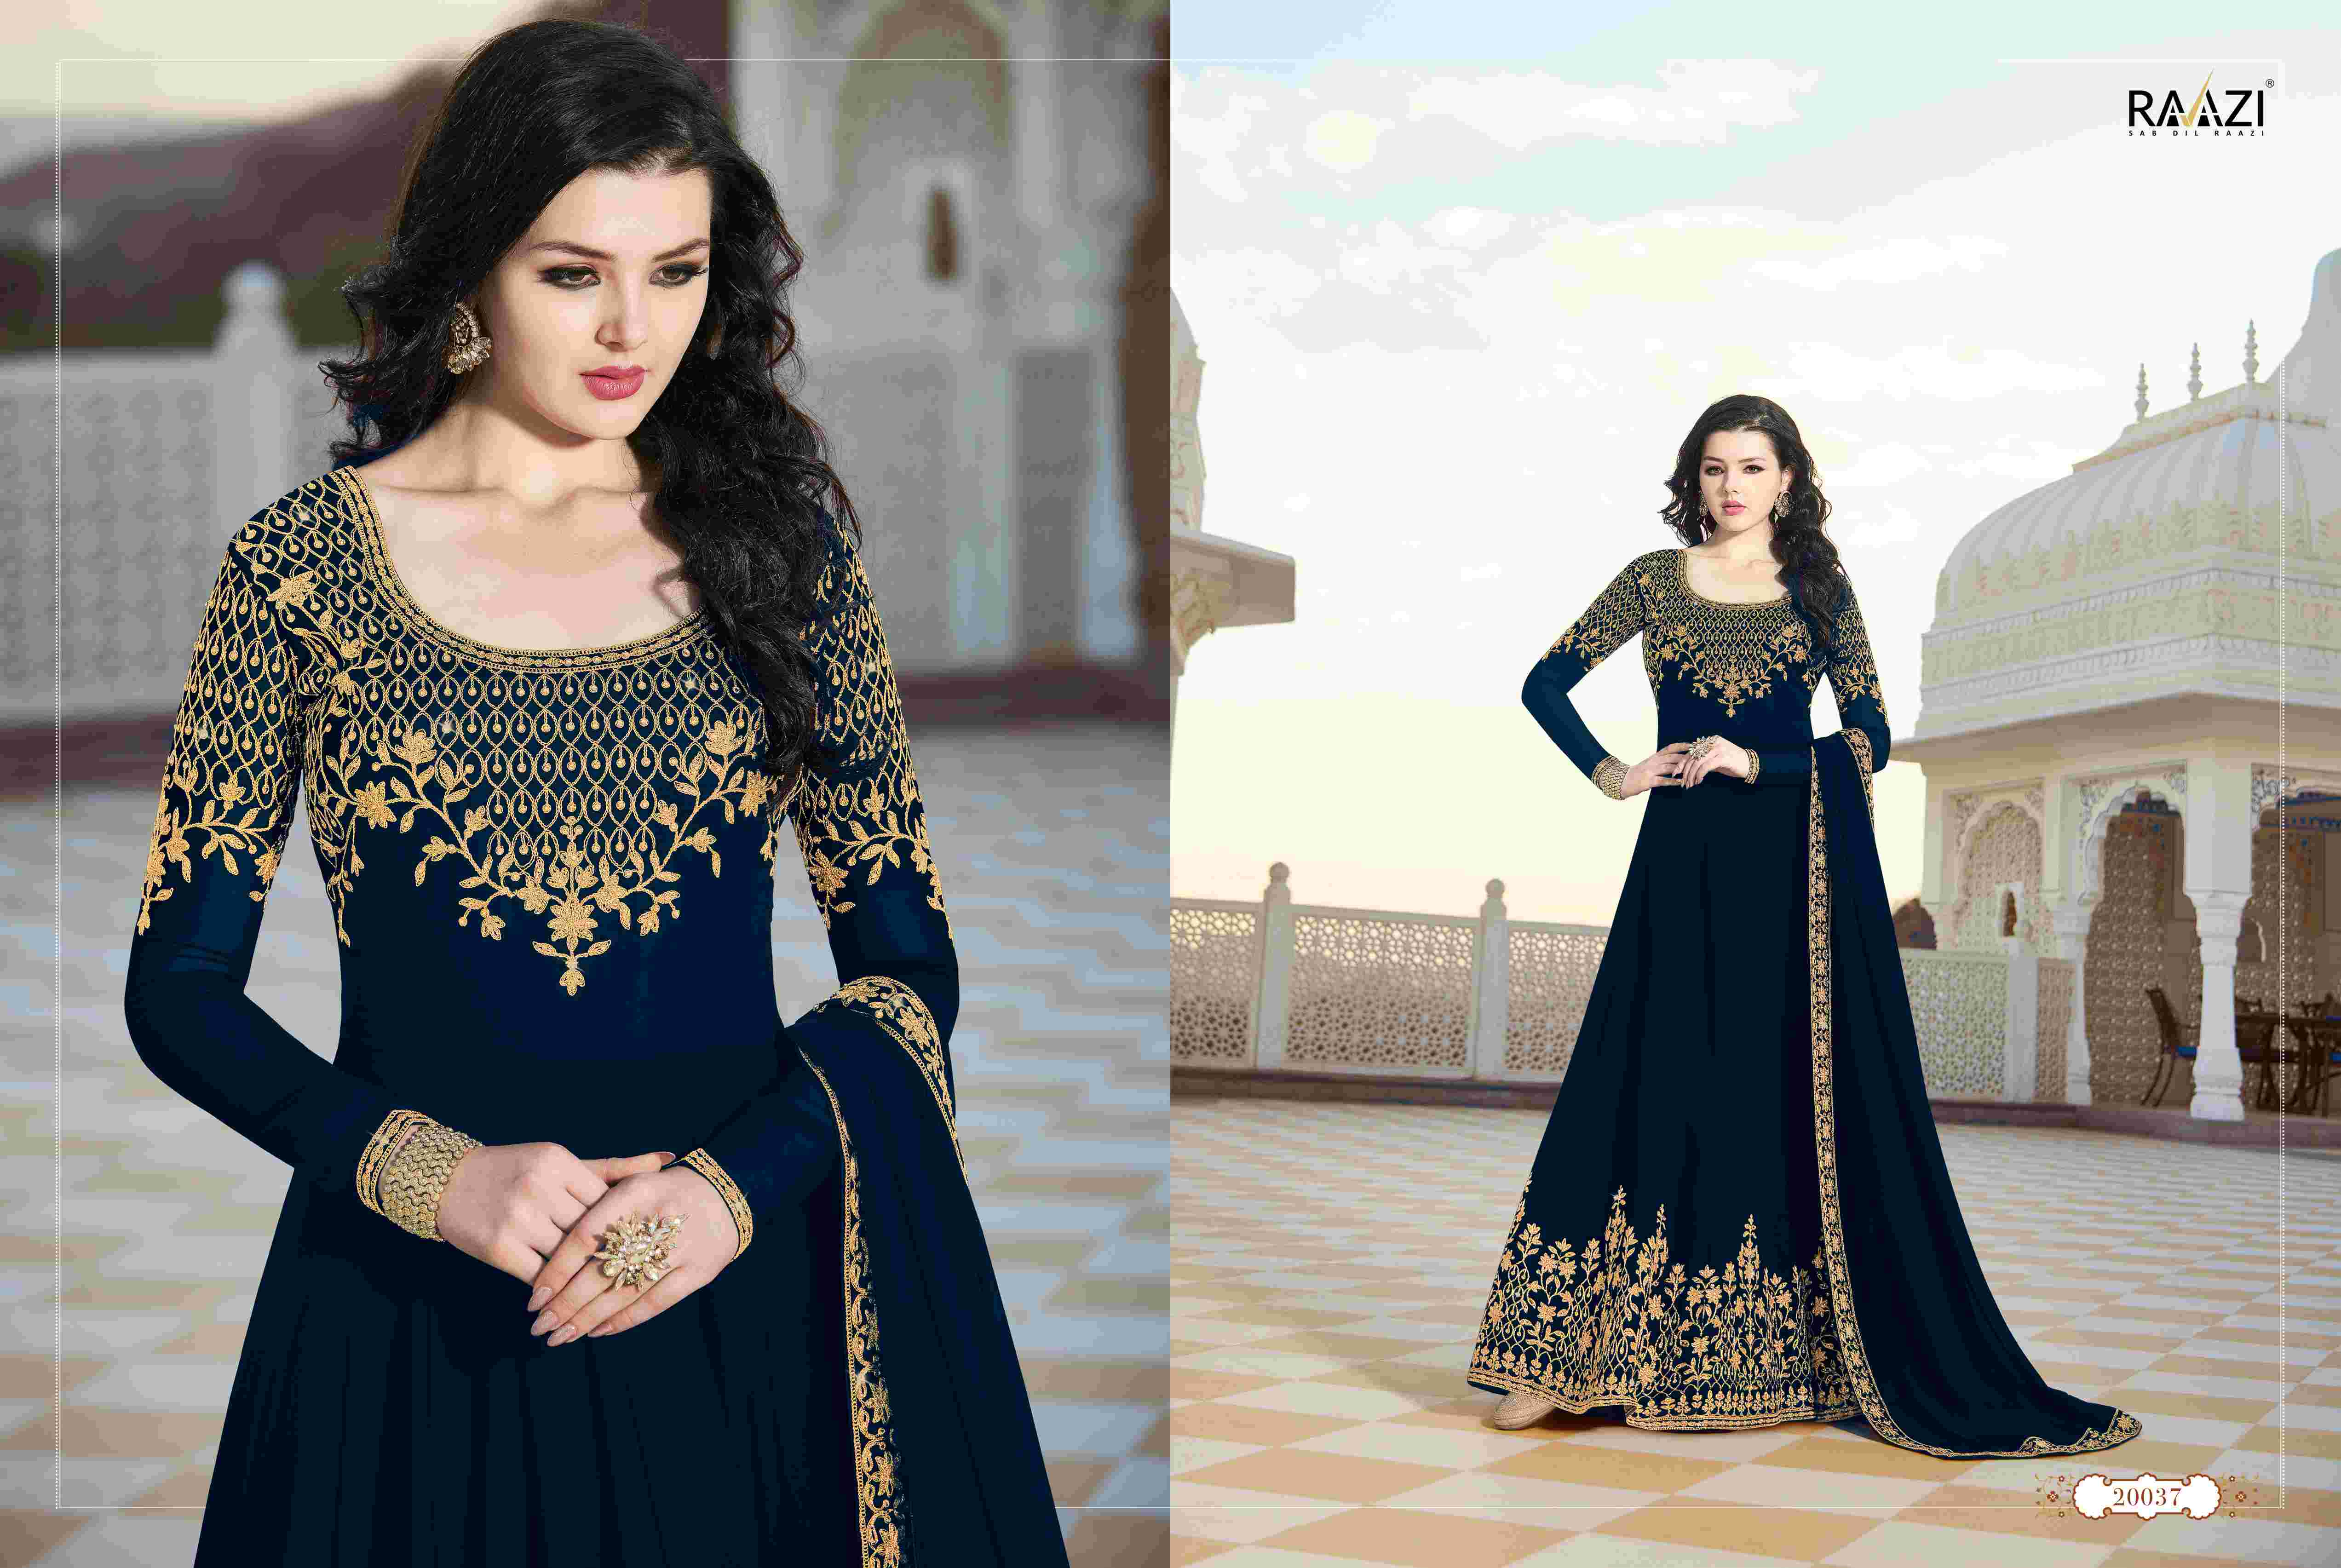 3376fed8cb Rama Fashions Raazi 20037 Colors Salwar Kameez By Rama Fashions For ...